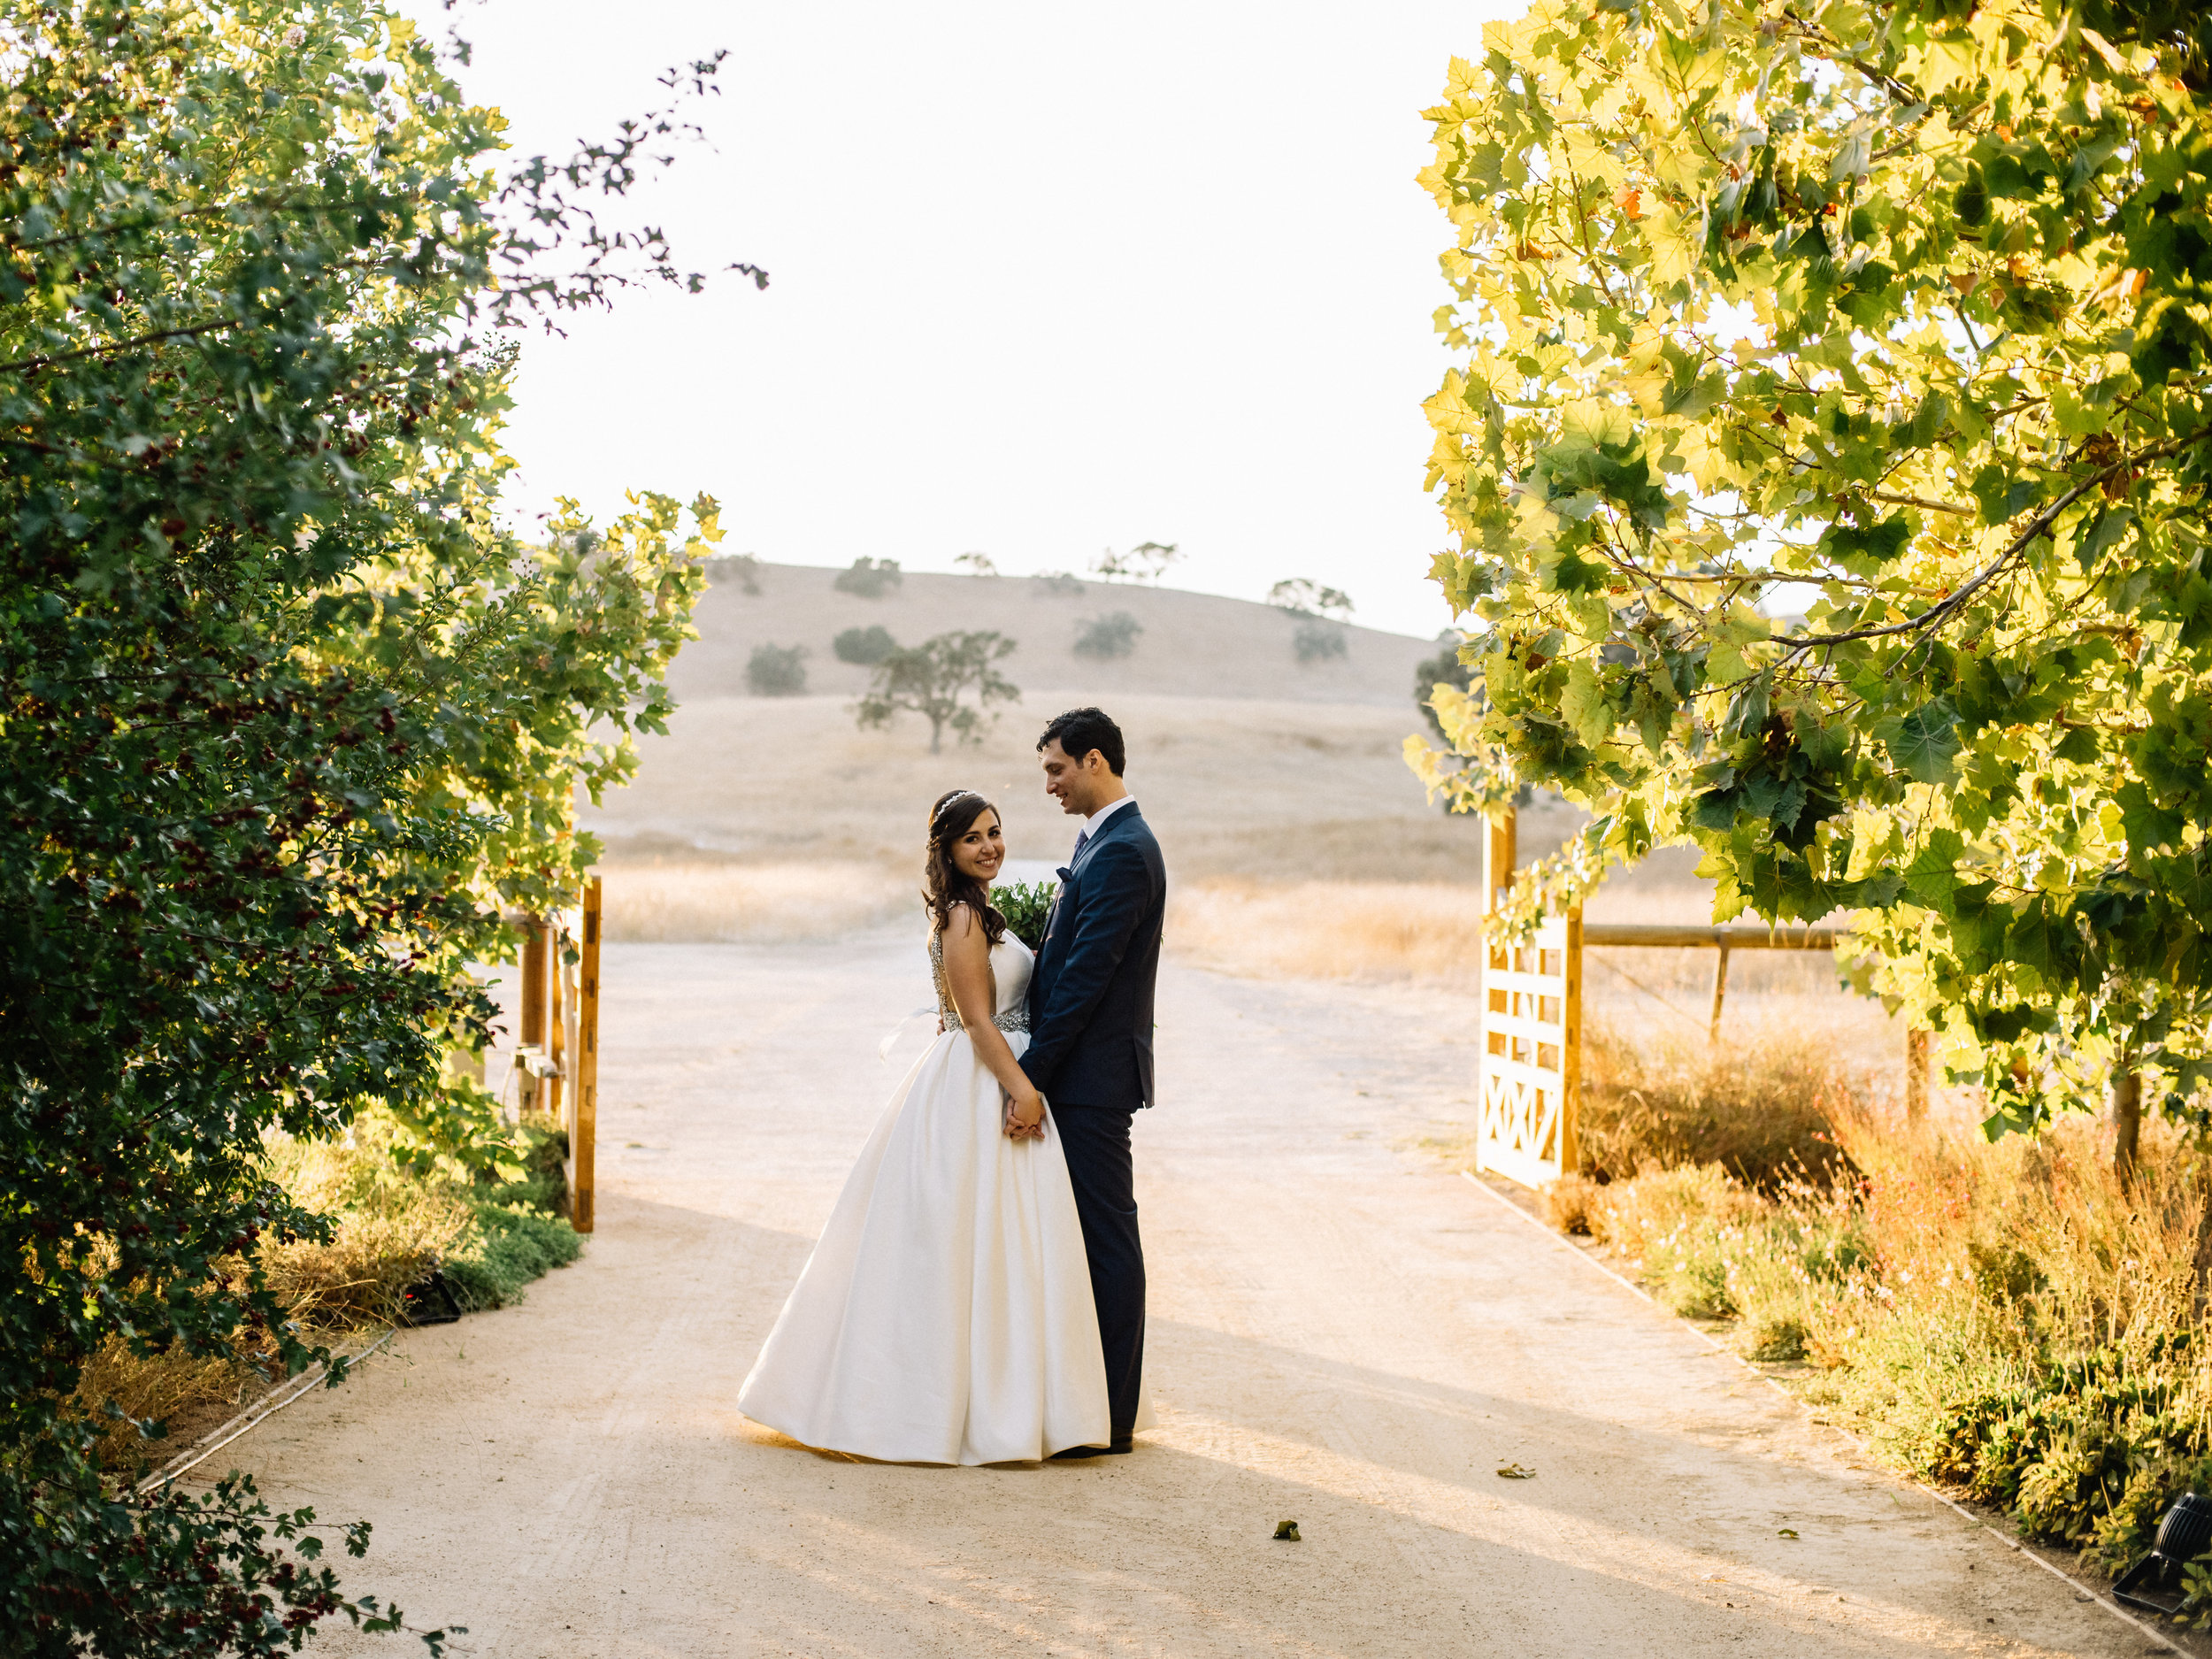 santa-barbara-elopement-elope-wedding-planner-planning-coordinator-day-of-intimate-event-design-kestrel-park-santa-ynez-english-country-estate-garden-castle (36).jpg